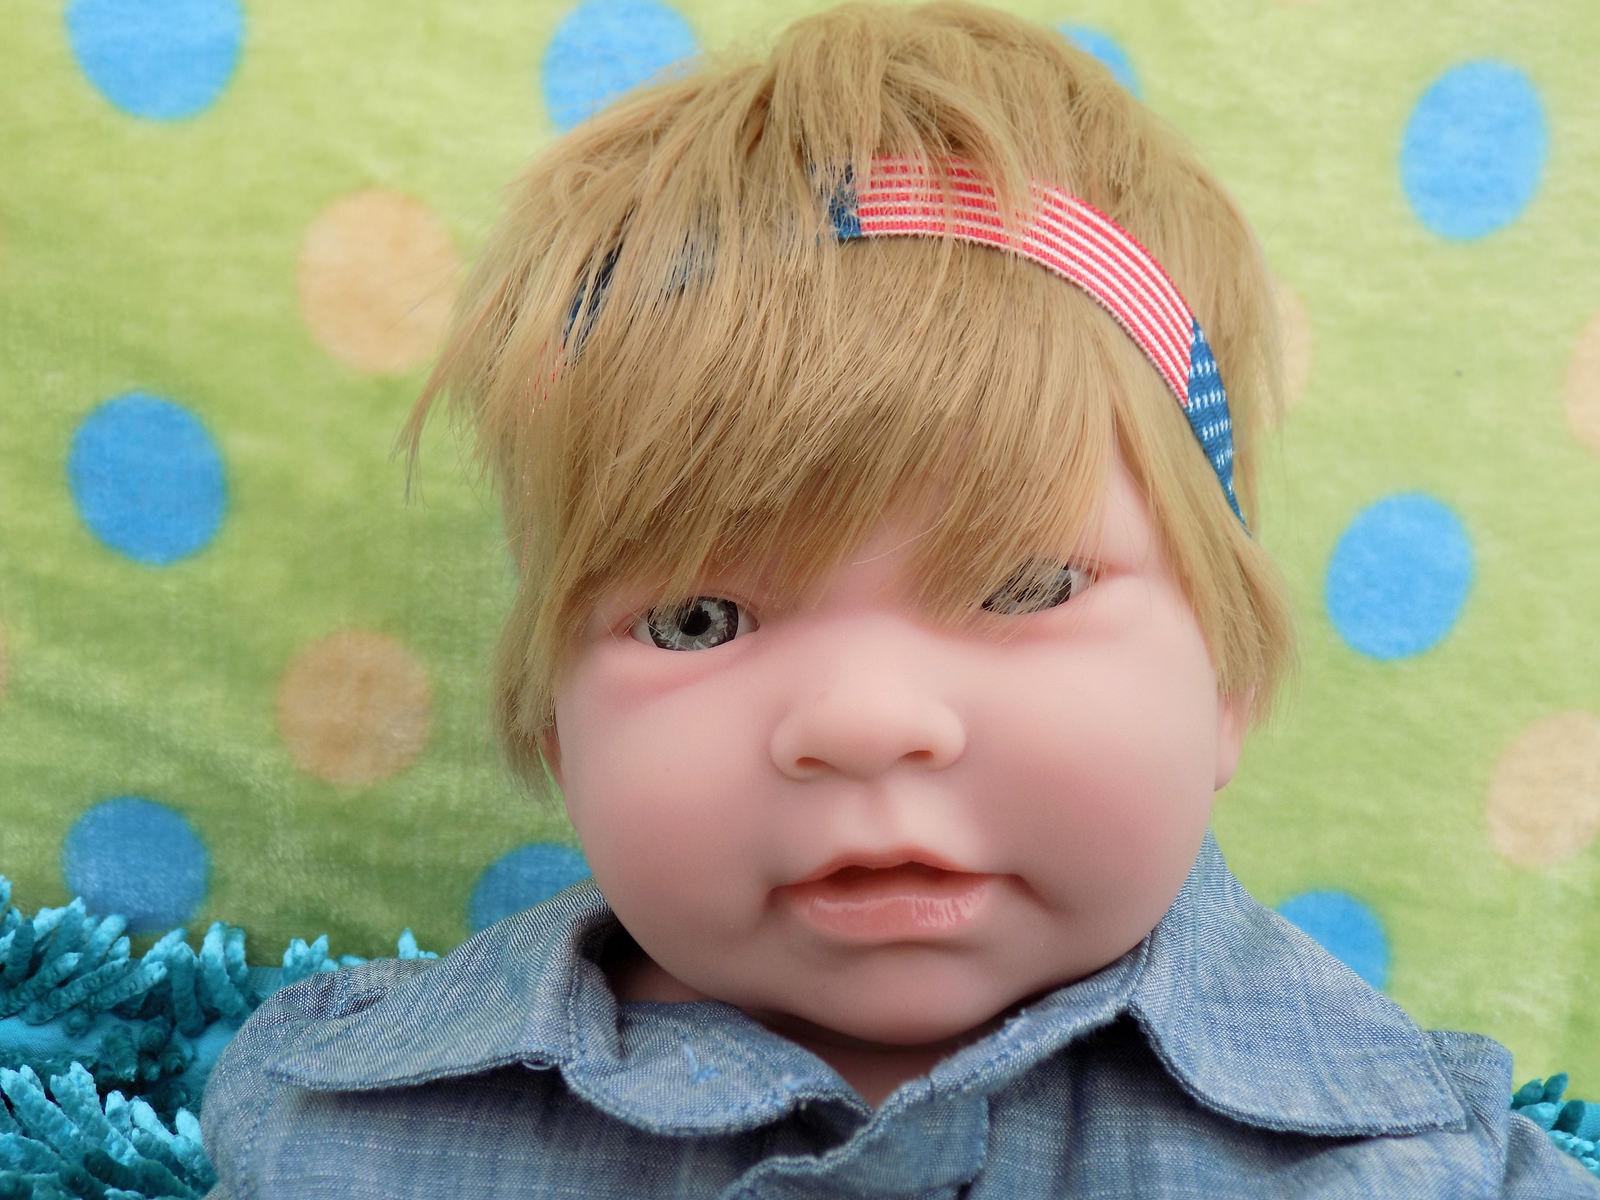 Trato Super Muñeca Bebé Niño Rubio 17  Berenguer Recién nacido Reborn Vinilo Suave Silicona